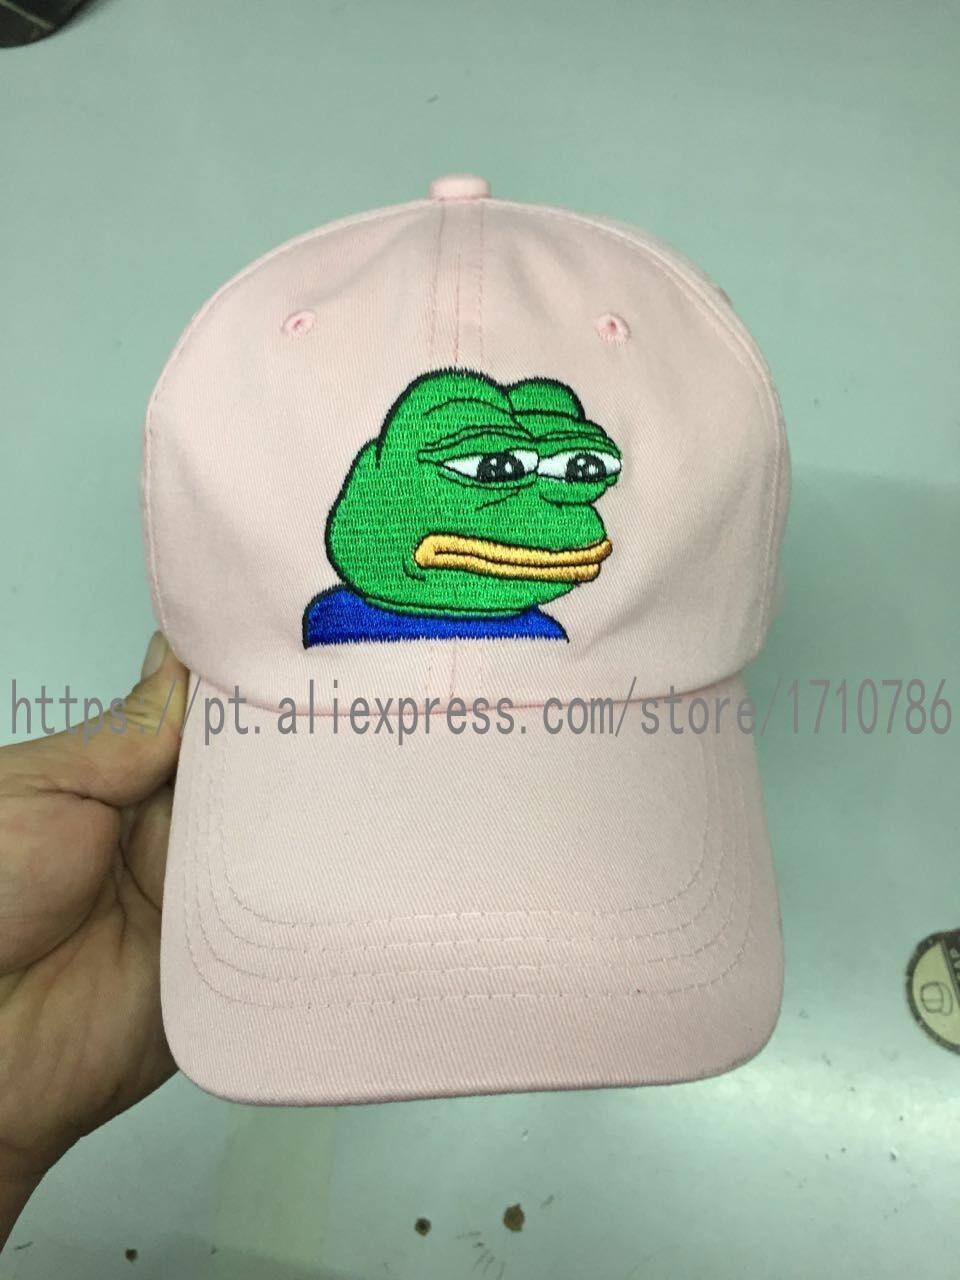 None Of My Business Emoji King Lebron Jame Sad Kermit Tea Hat Pepe The Sad Meme Frog Twitter Famous Dank Meme Hat slide Buckle